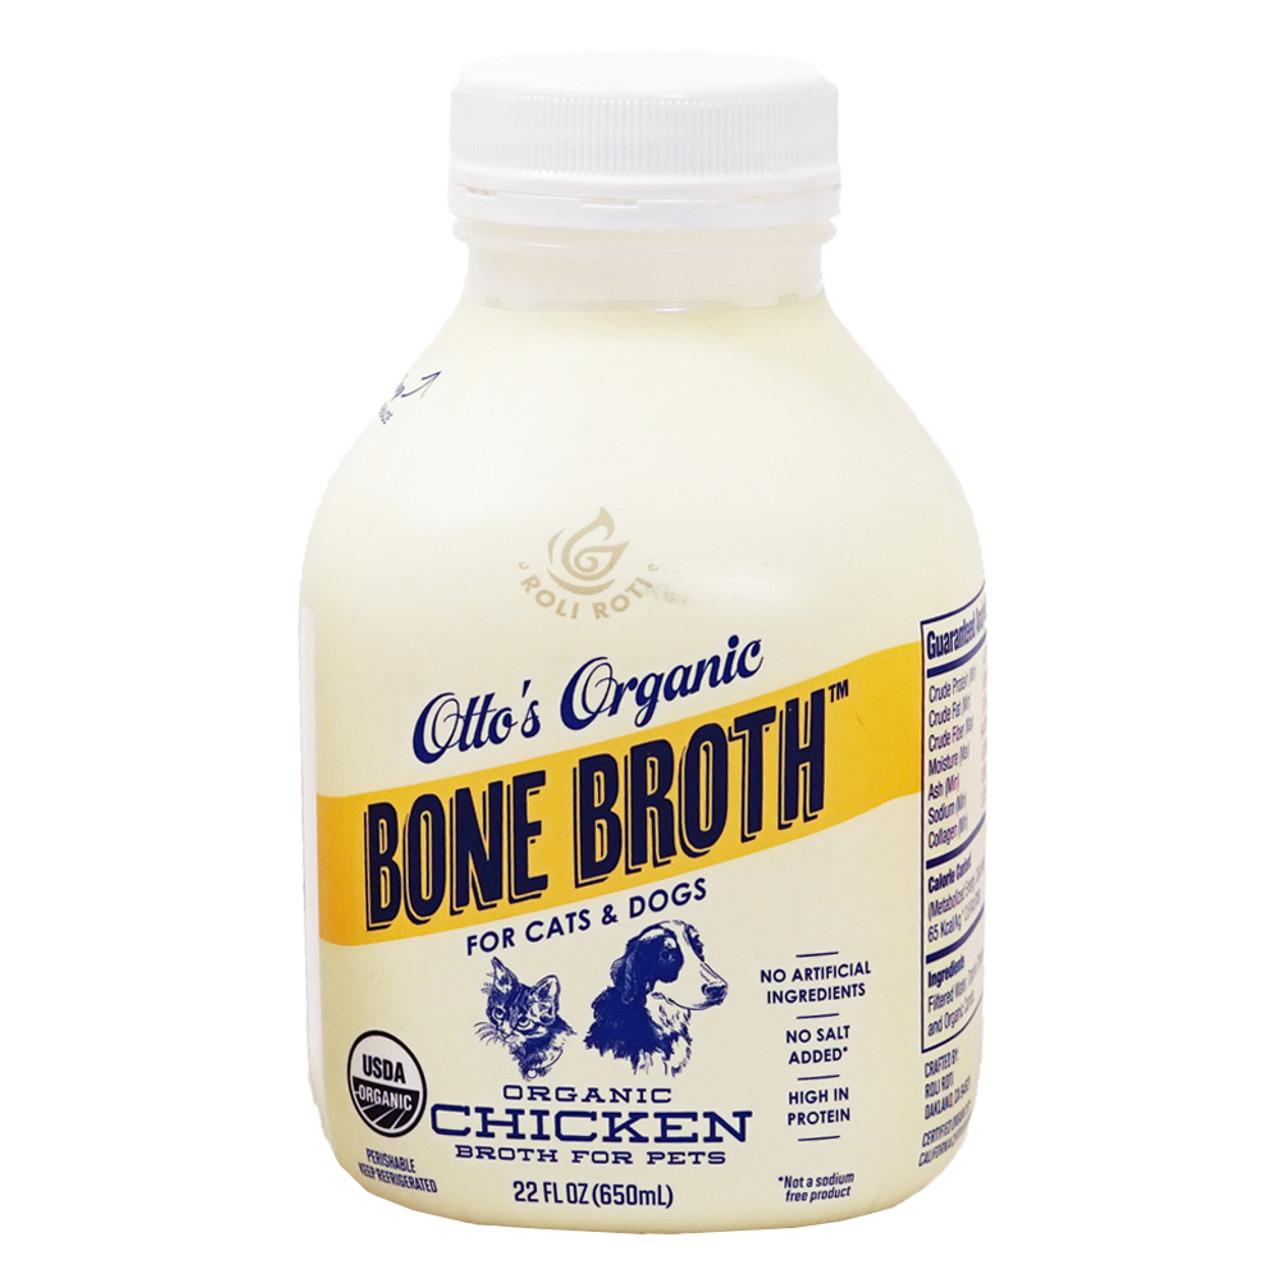 Otto's Organic Frozen Chicken Bone Broth For Cats & Dogs